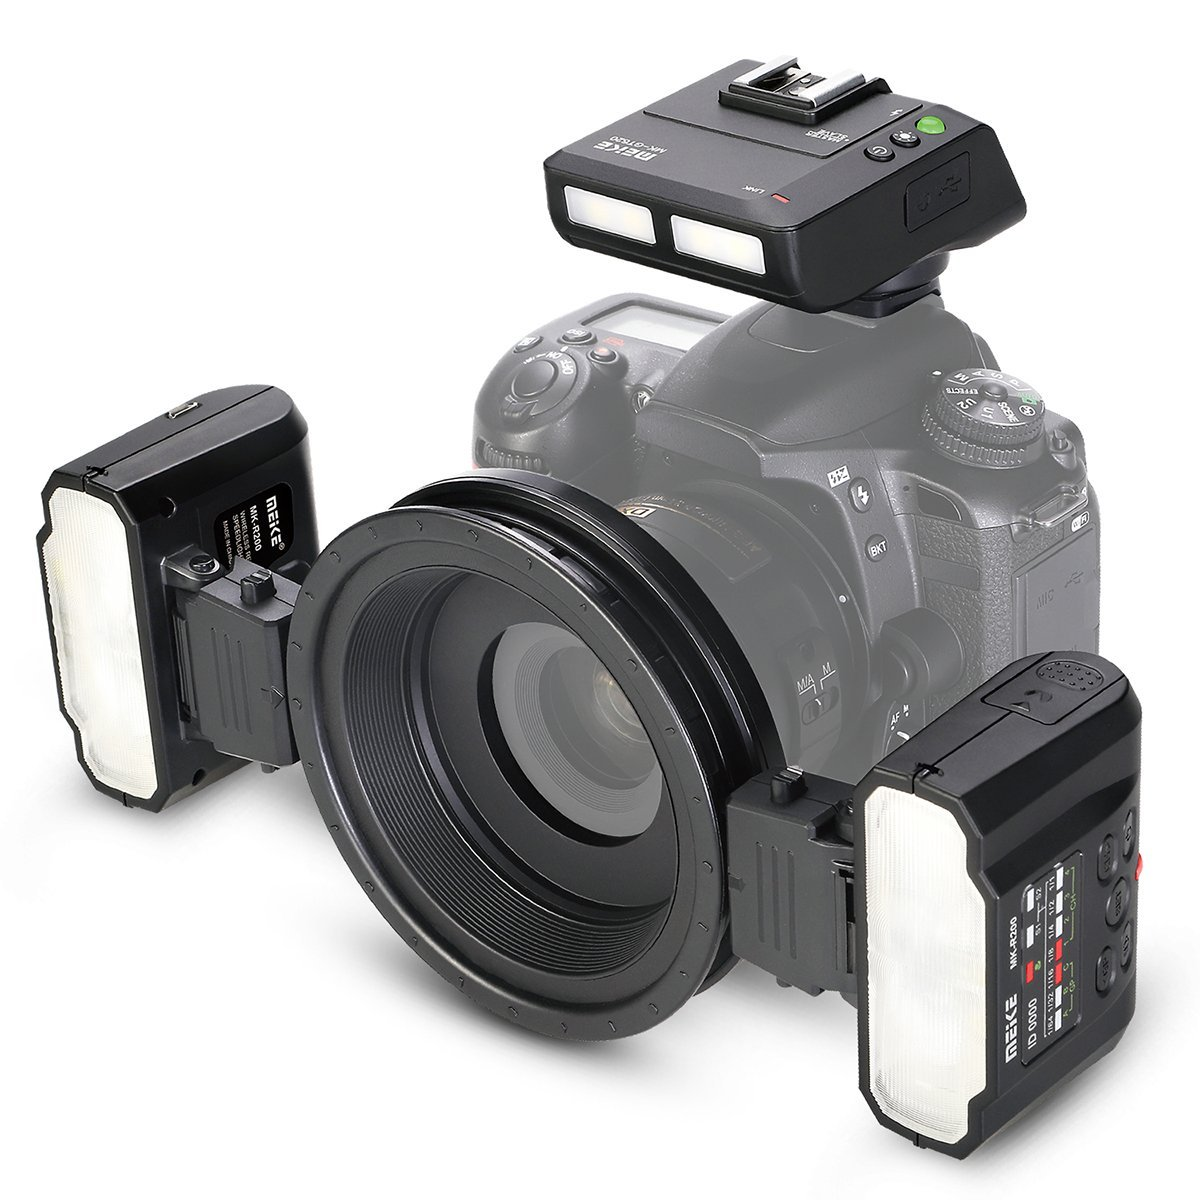 Meike MK-MT24 Macro Twin Lite Flash for Nikon Digital SLR Cameras meike mk d750 battery grip pack for nikon d750 dslr camera replacement mb d16 as en el15 battery